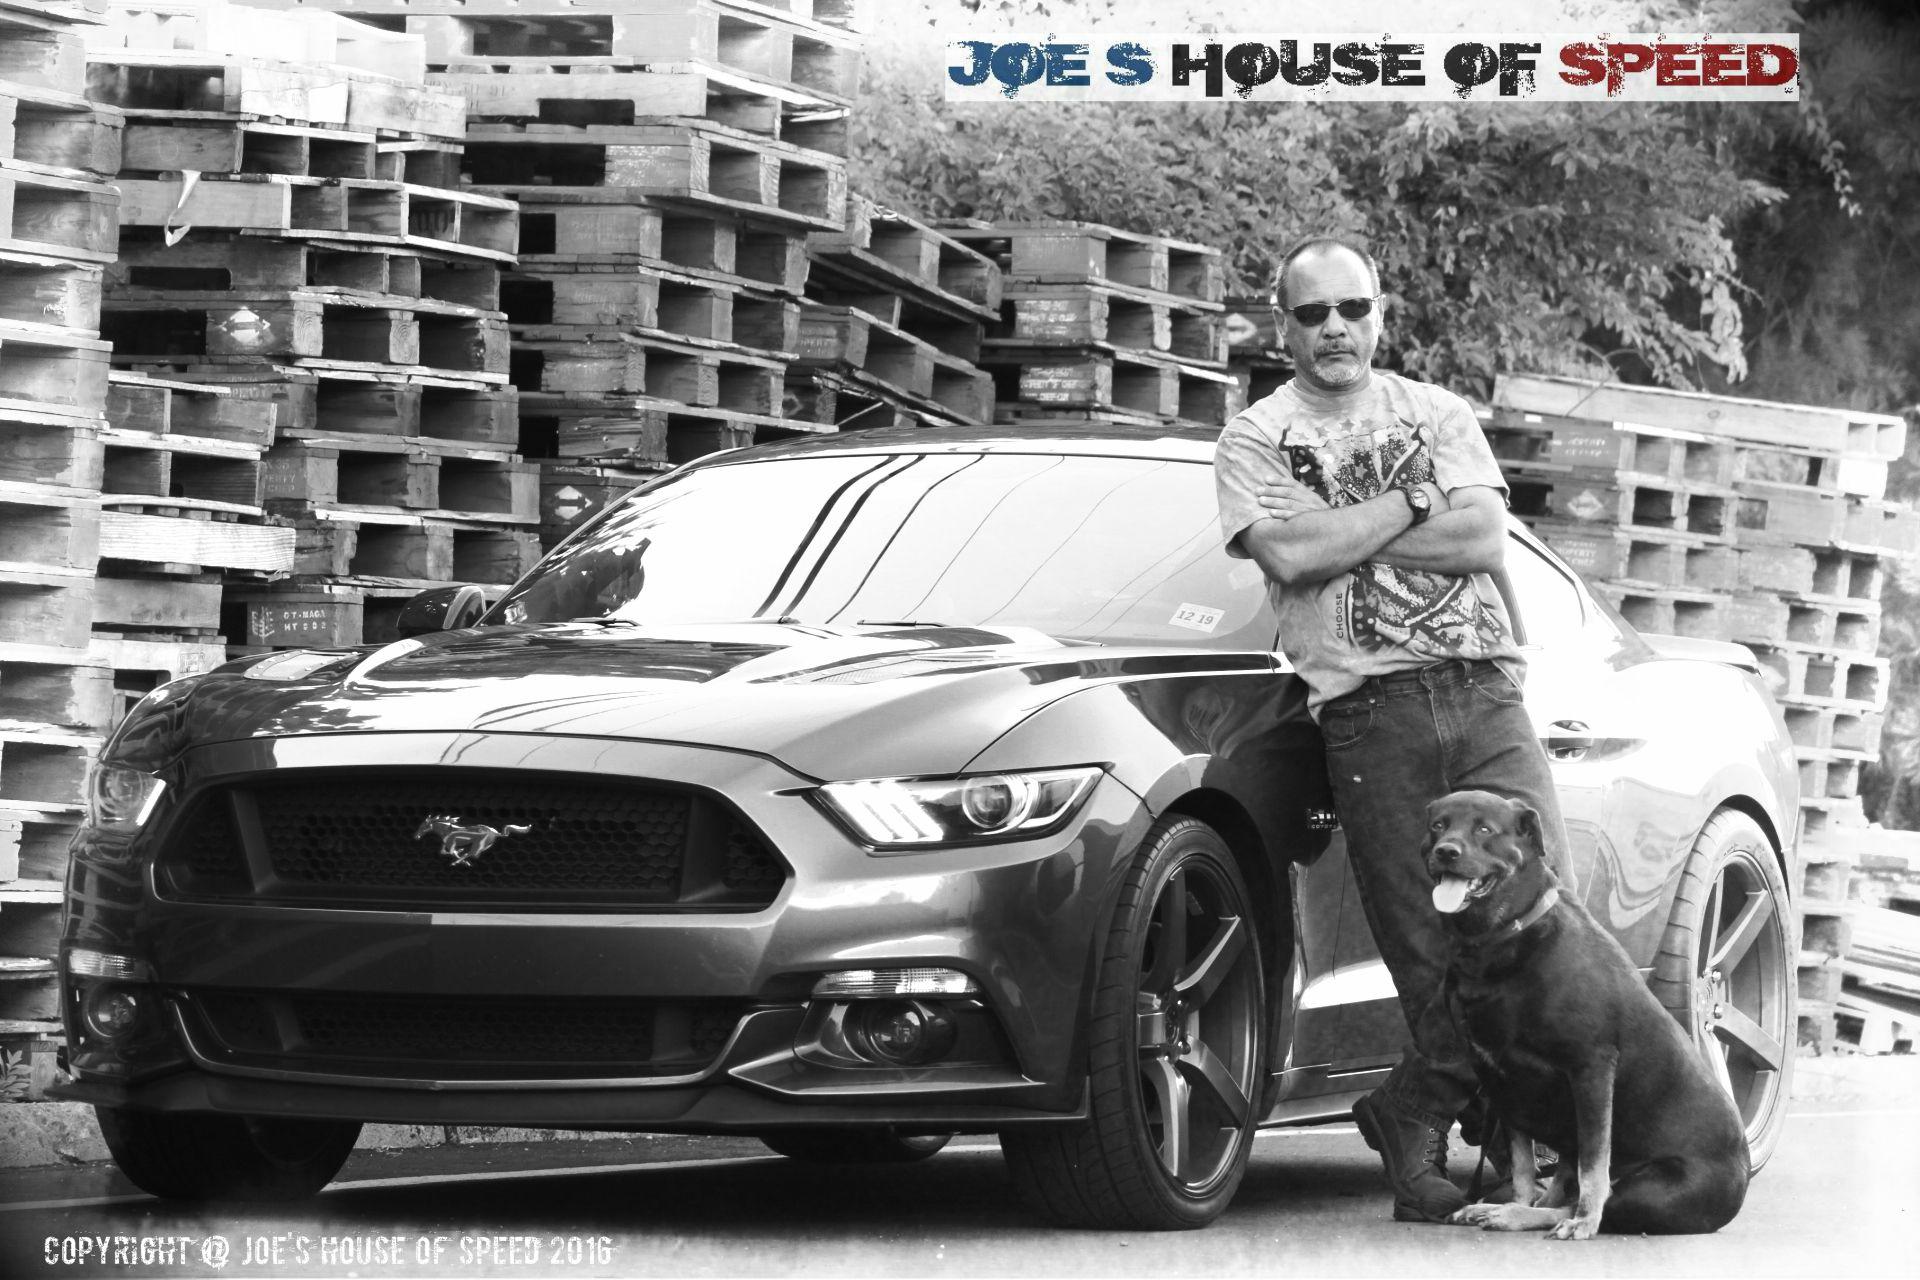 Bmw Image By Joe S House Of Speed On Joe S House Of Speed Bmw Car Car